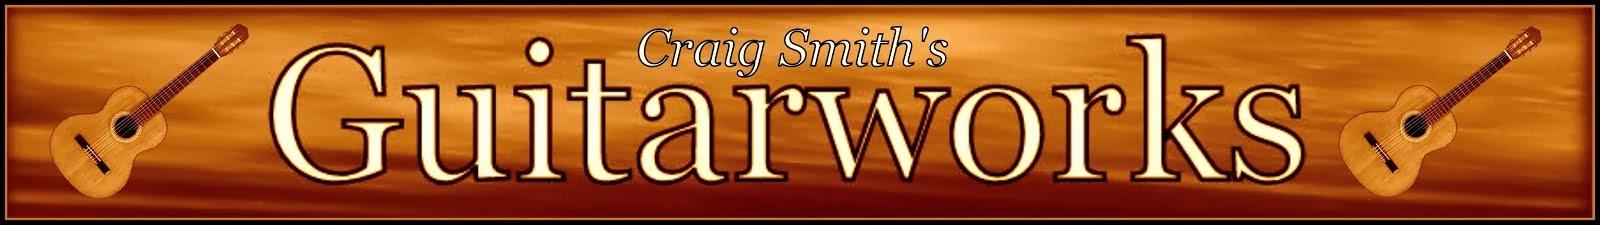 Craig Smith's Guitarworks